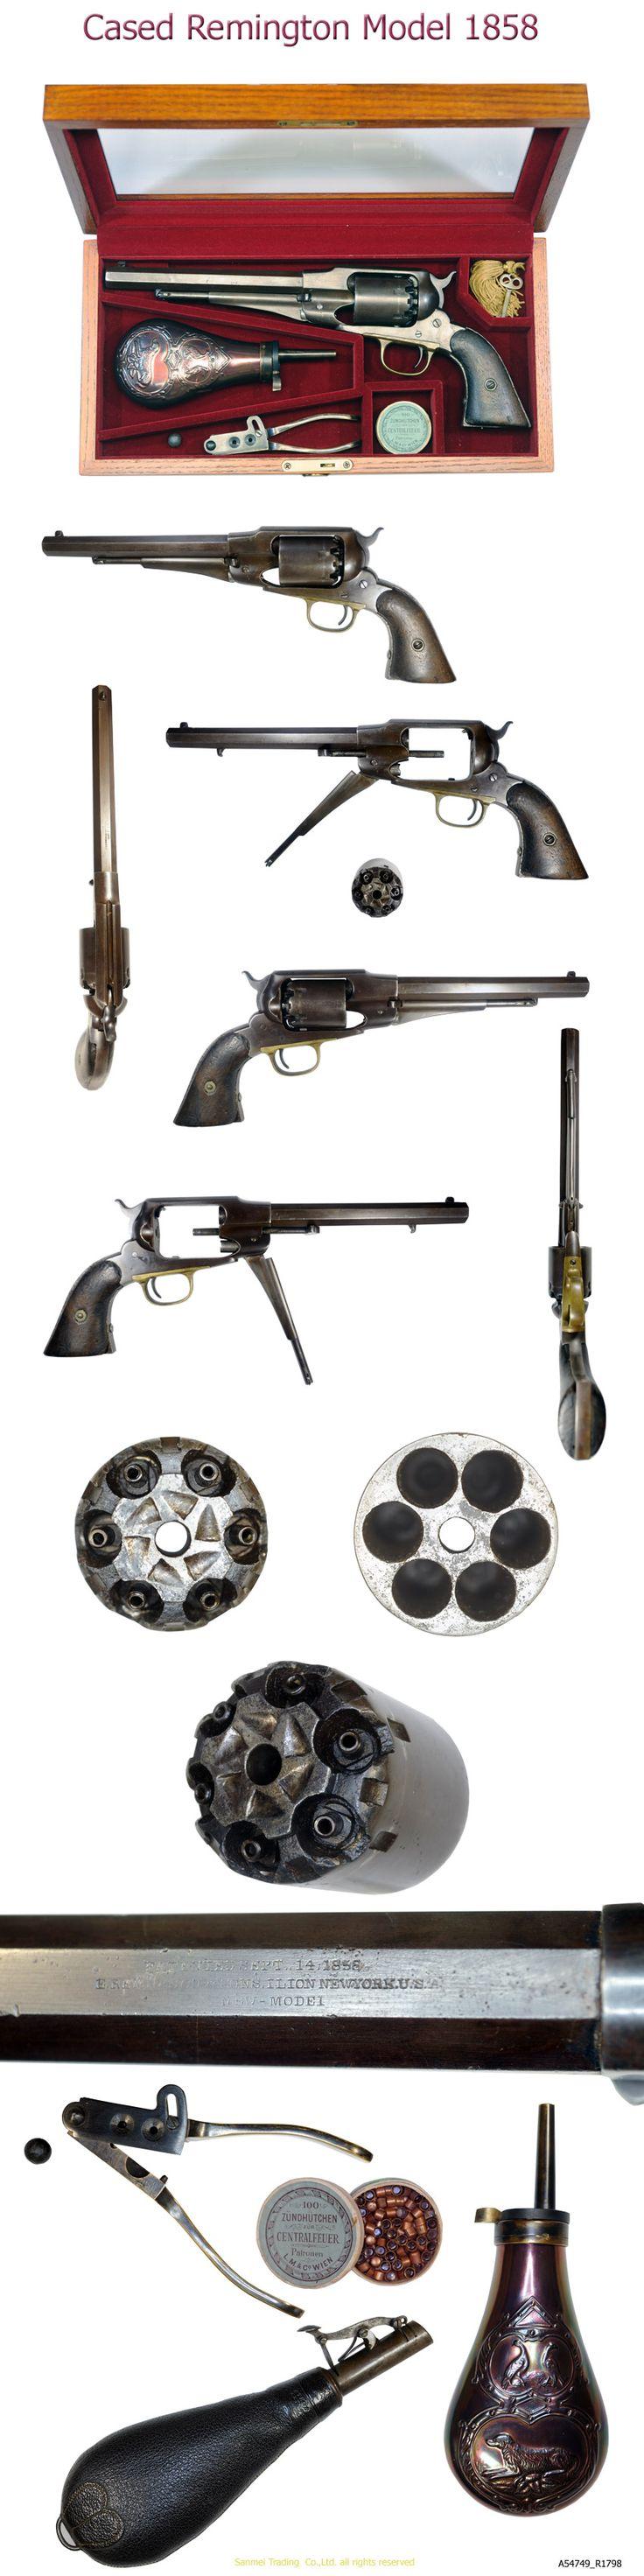 New Model Army Revolver Remington model 1858